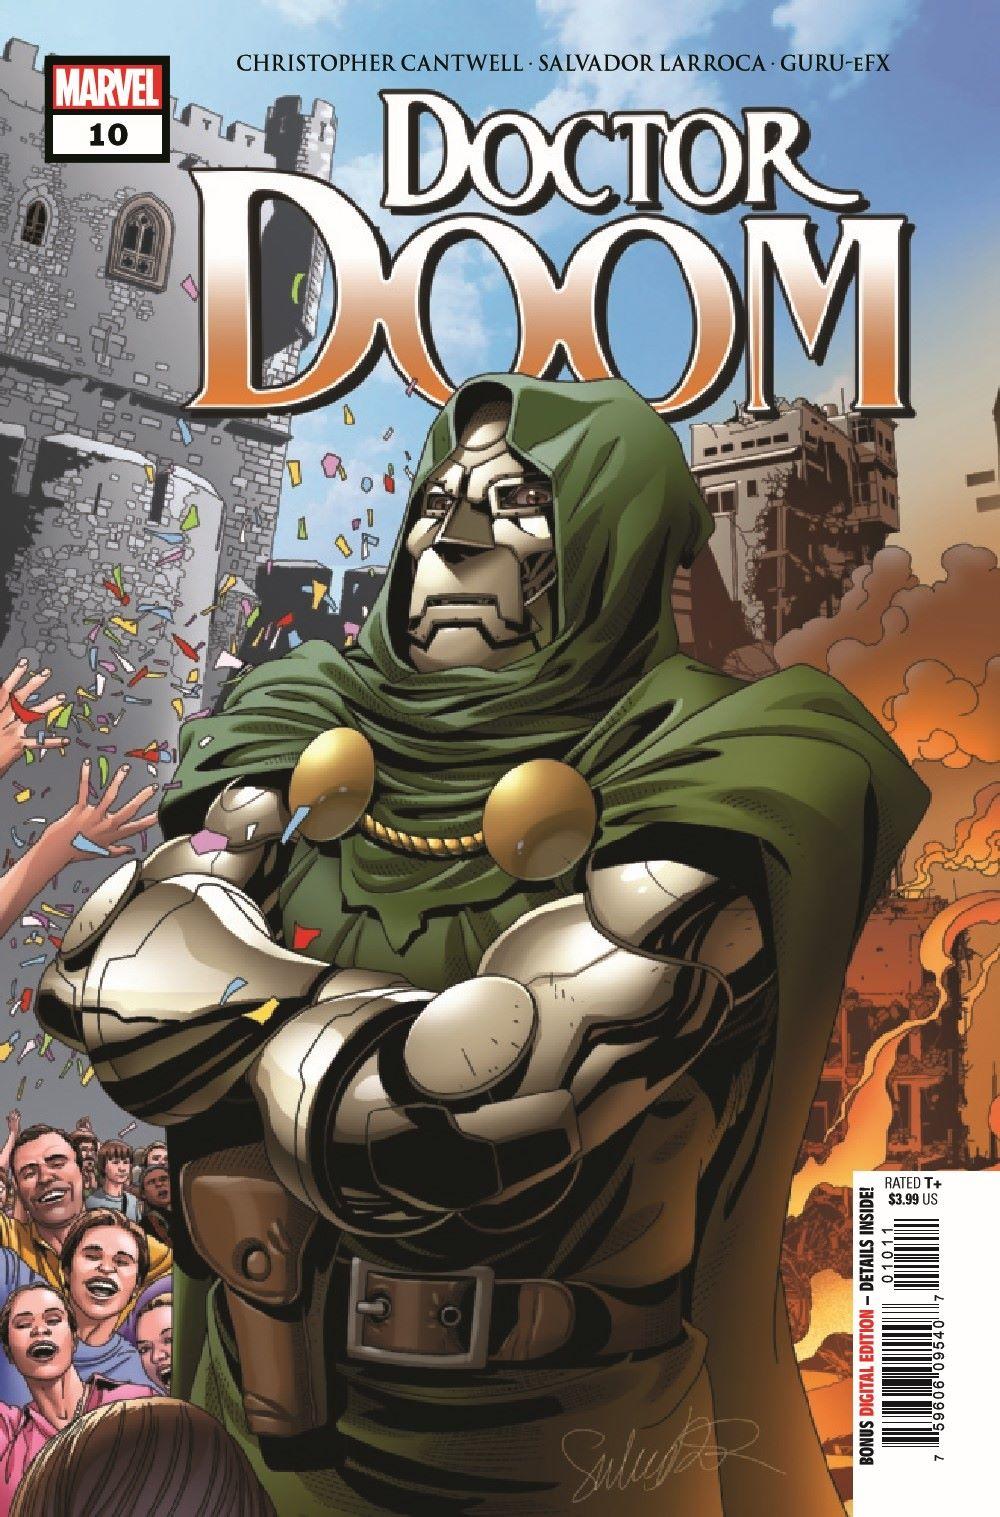 DOOM2019010_Preview-1 ComicList Previews: DOCTOR DOOM #10